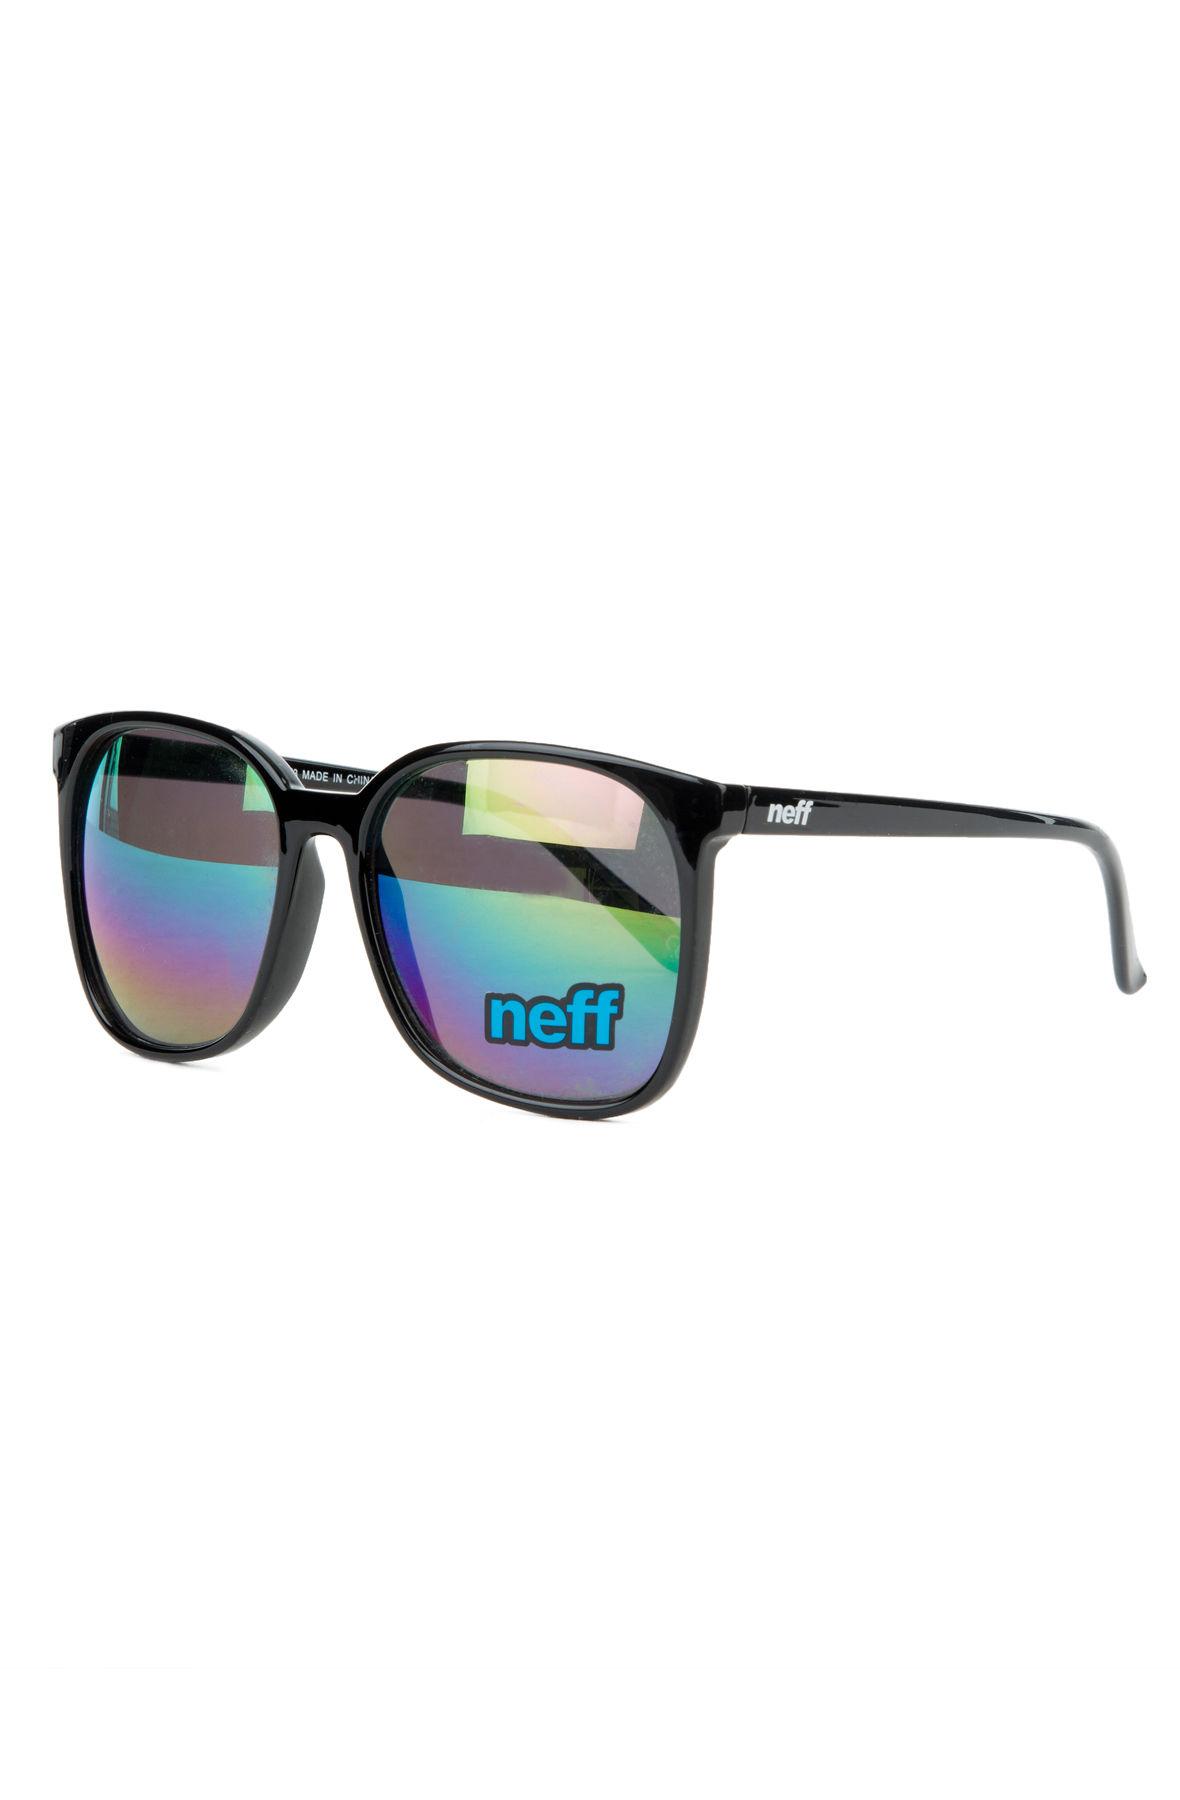 the women's oversized shield sunglasses in black